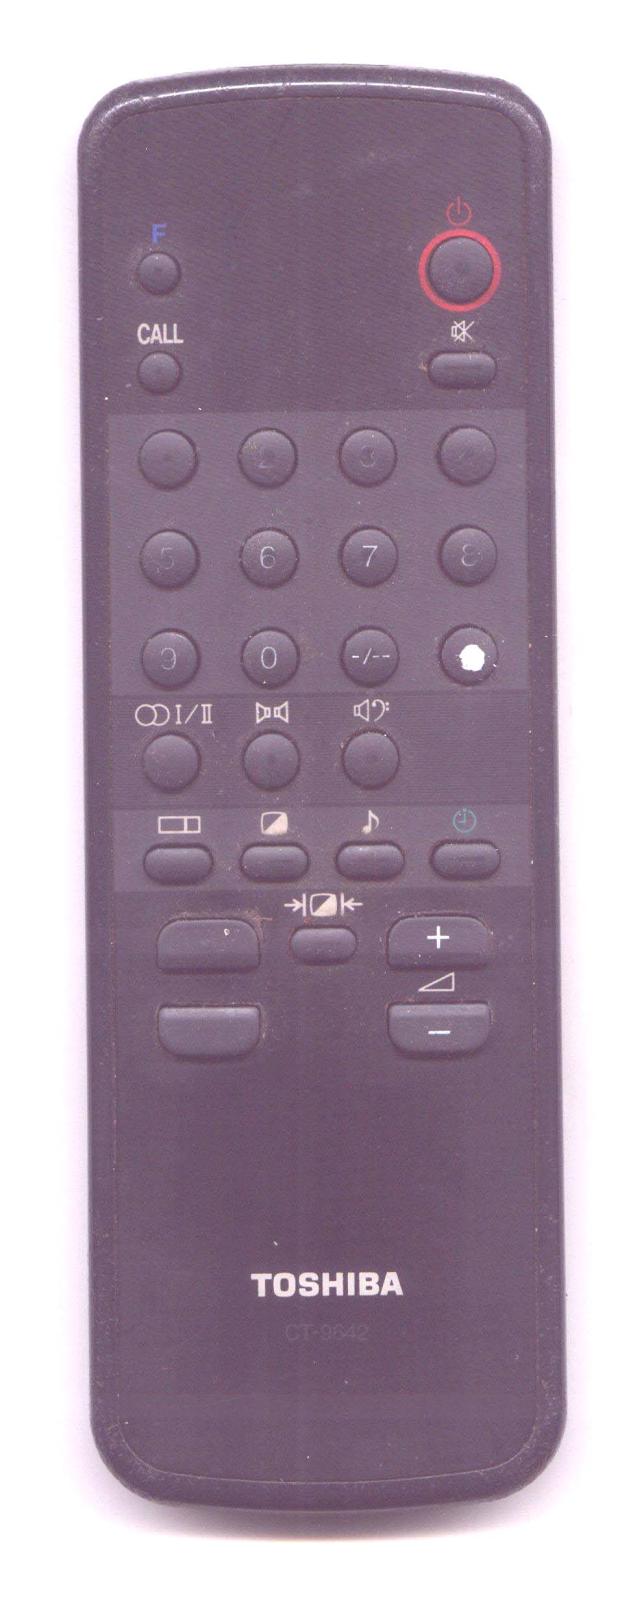 Control remoto TV TOSHIBA 2529TL CHASIS PB3941